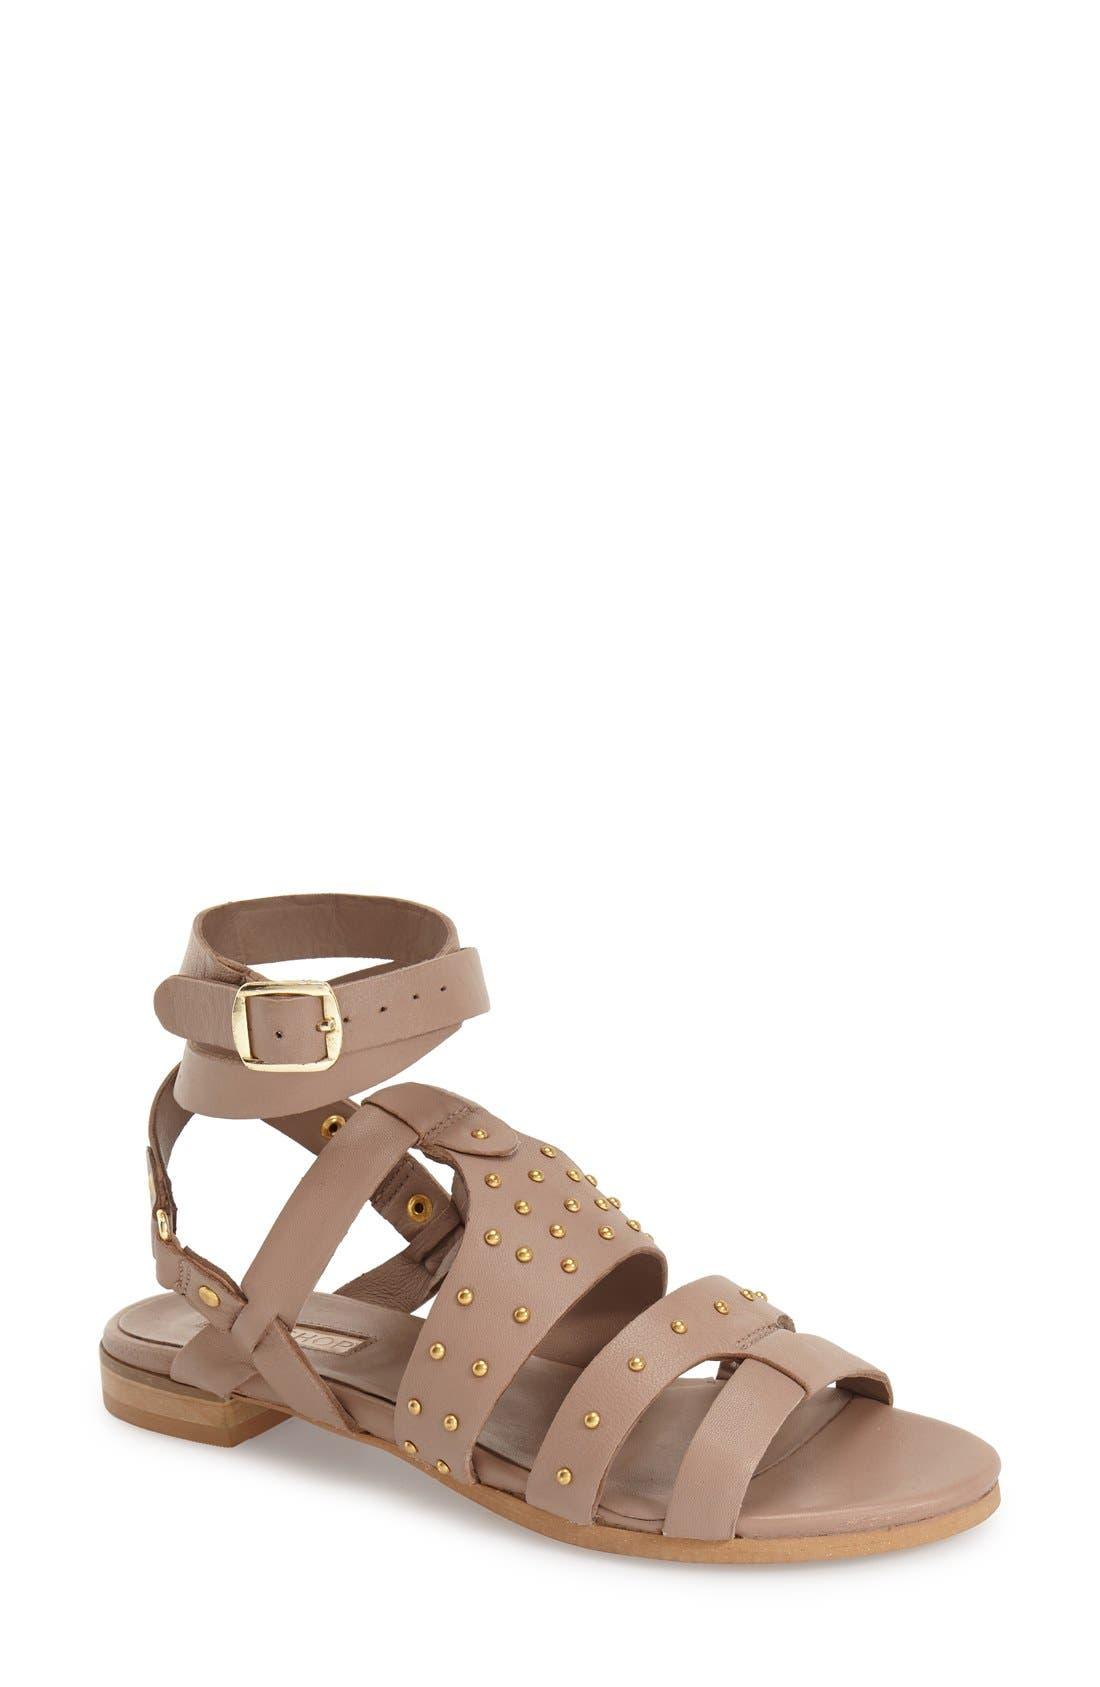 TOPSHOP 'Flame' Stud Wraparound Ankle Strap Sandal